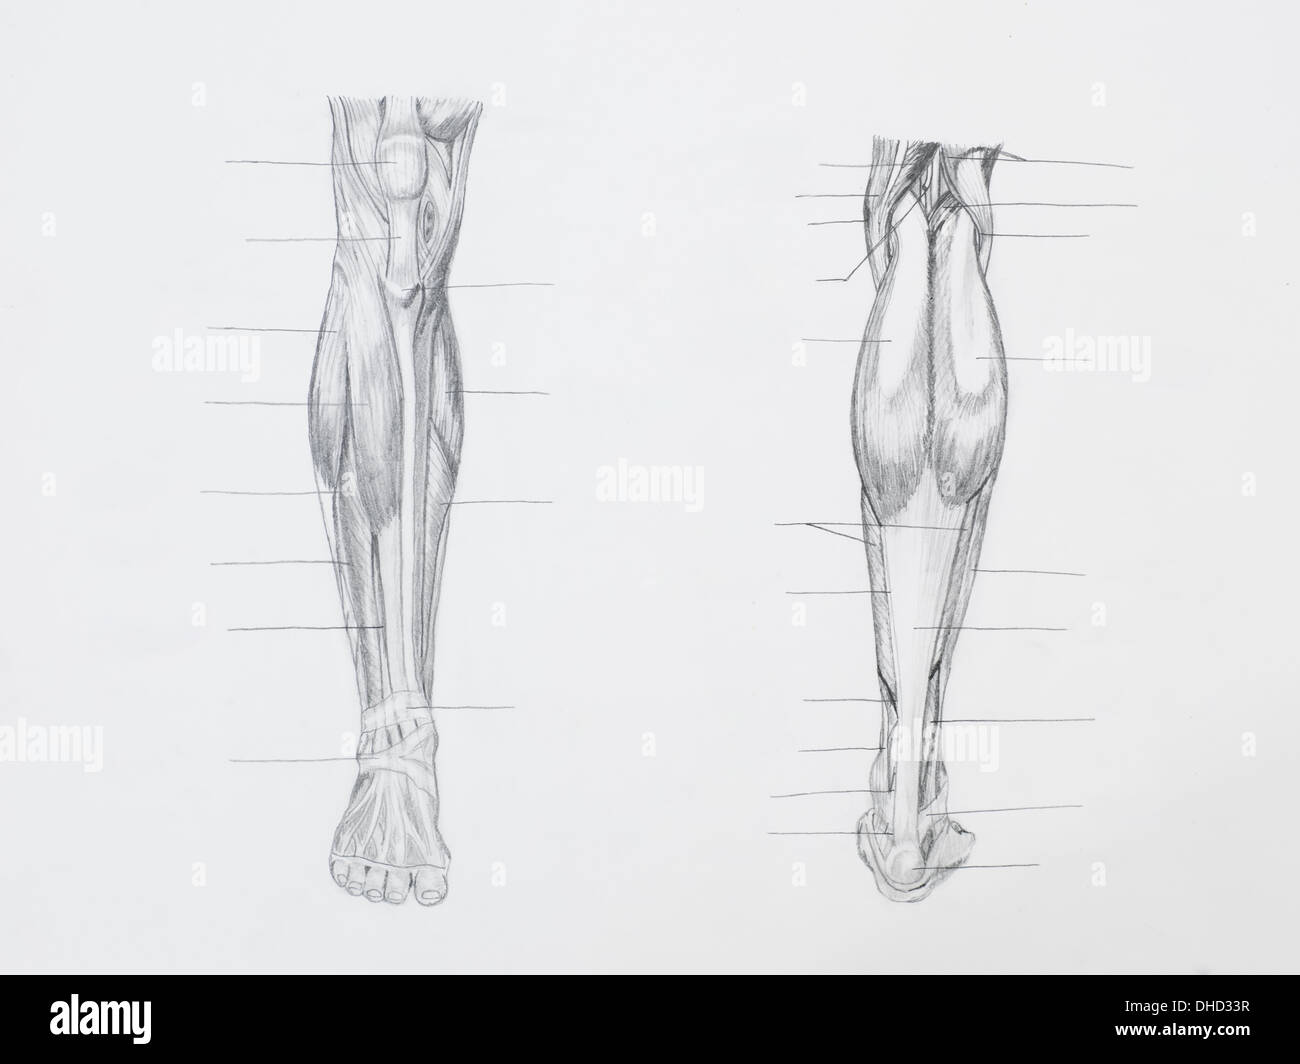 Human Muscle Foot Anatomy Stockfotos & Human Muscle Foot Anatomy ...